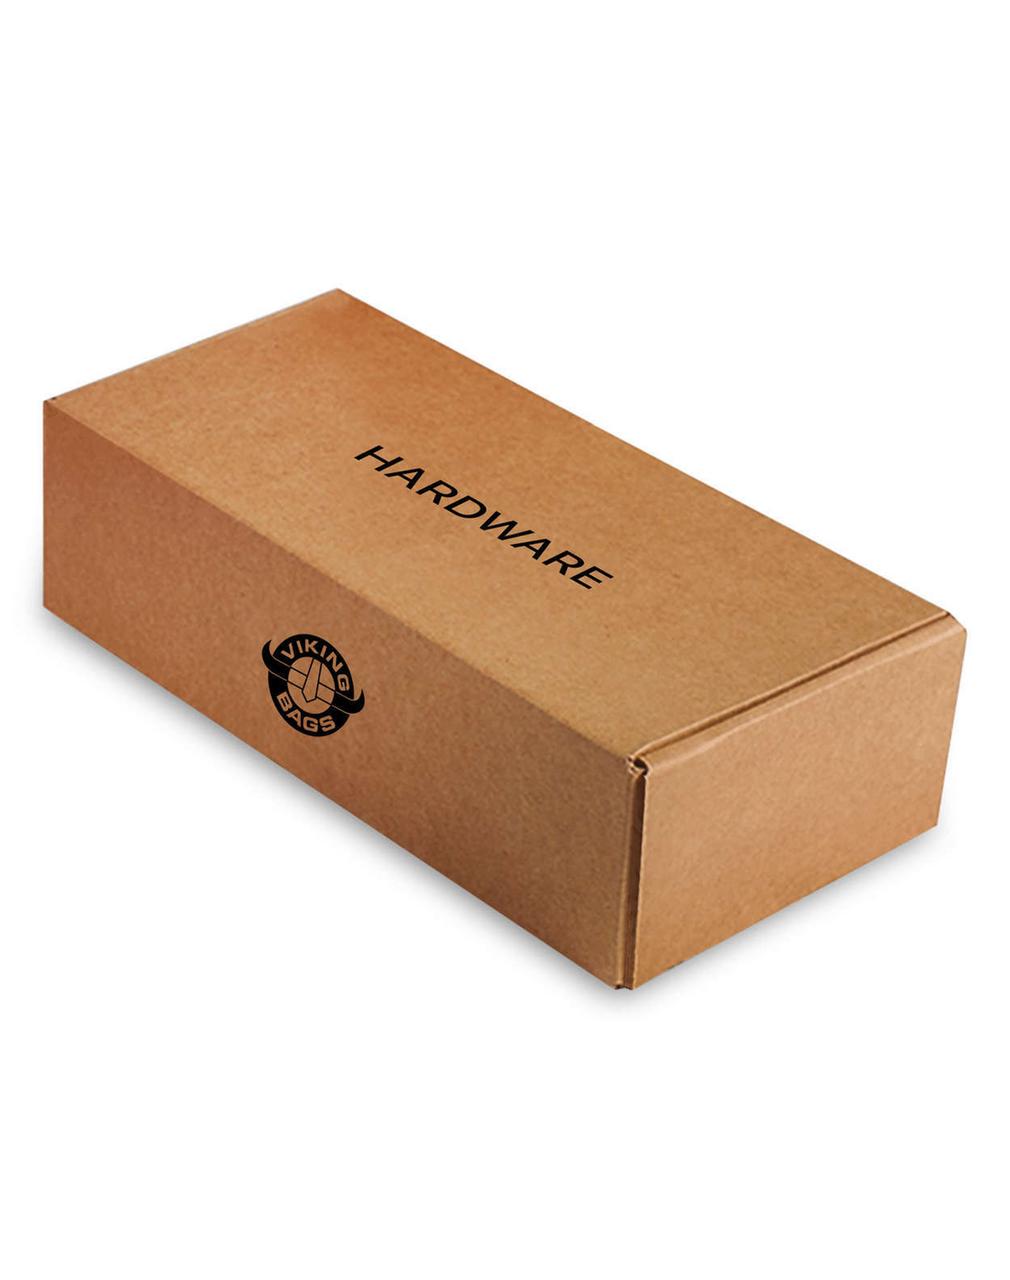 Honda 1500 Valkyrie Interstate SS Slanted Medium Motorcycle Saddlebags Hardware Box